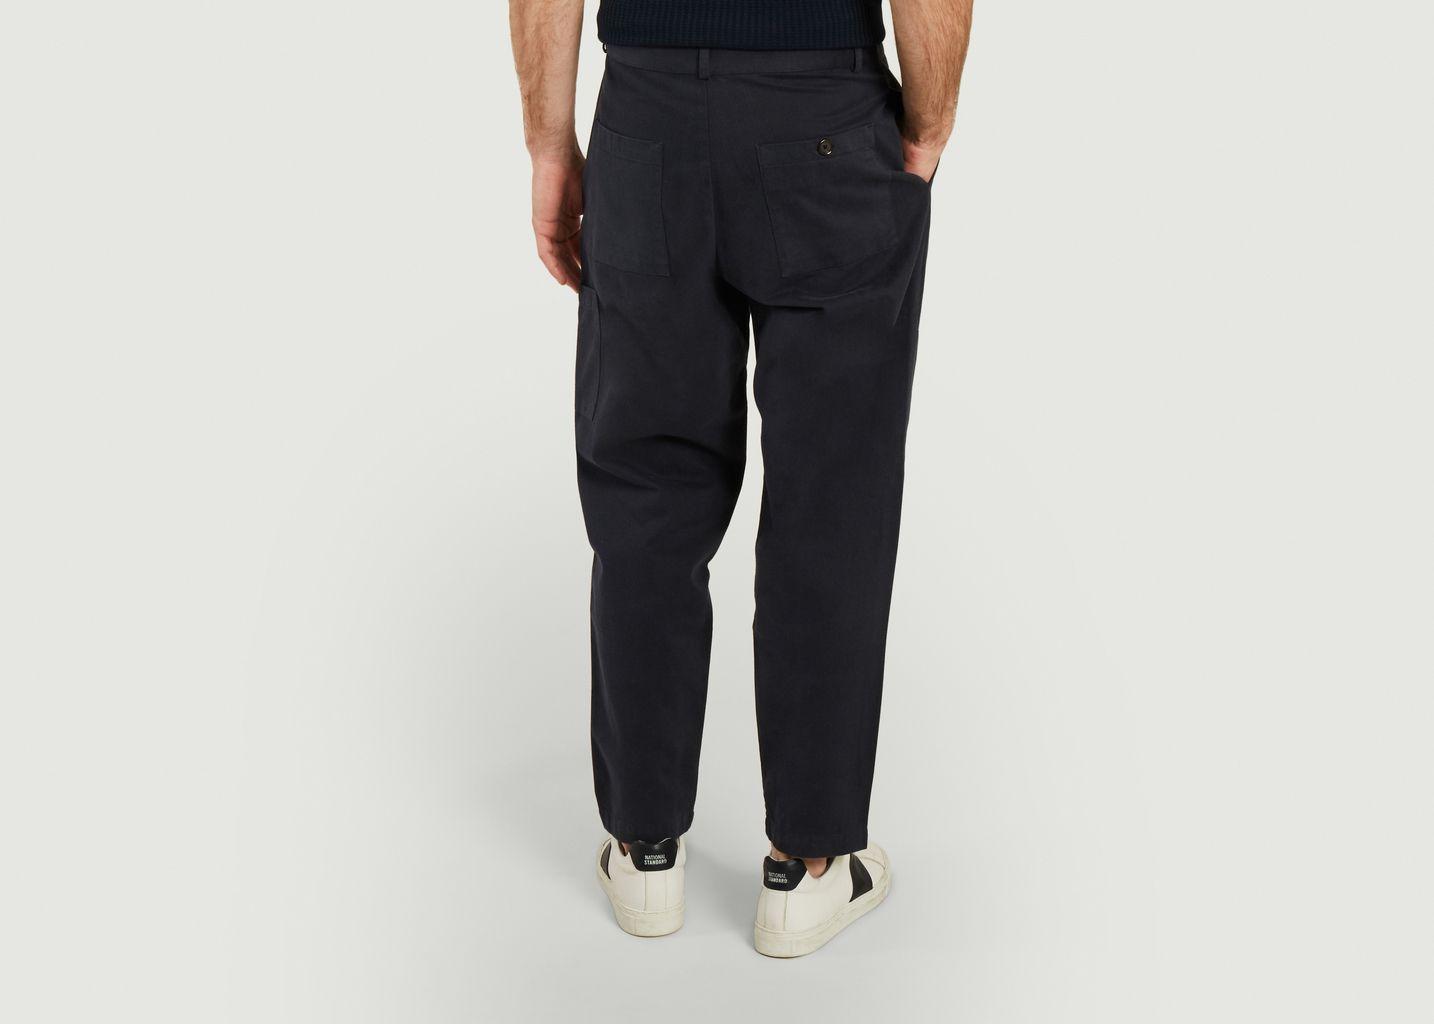 Pantalon Judo - Oliver Spencer